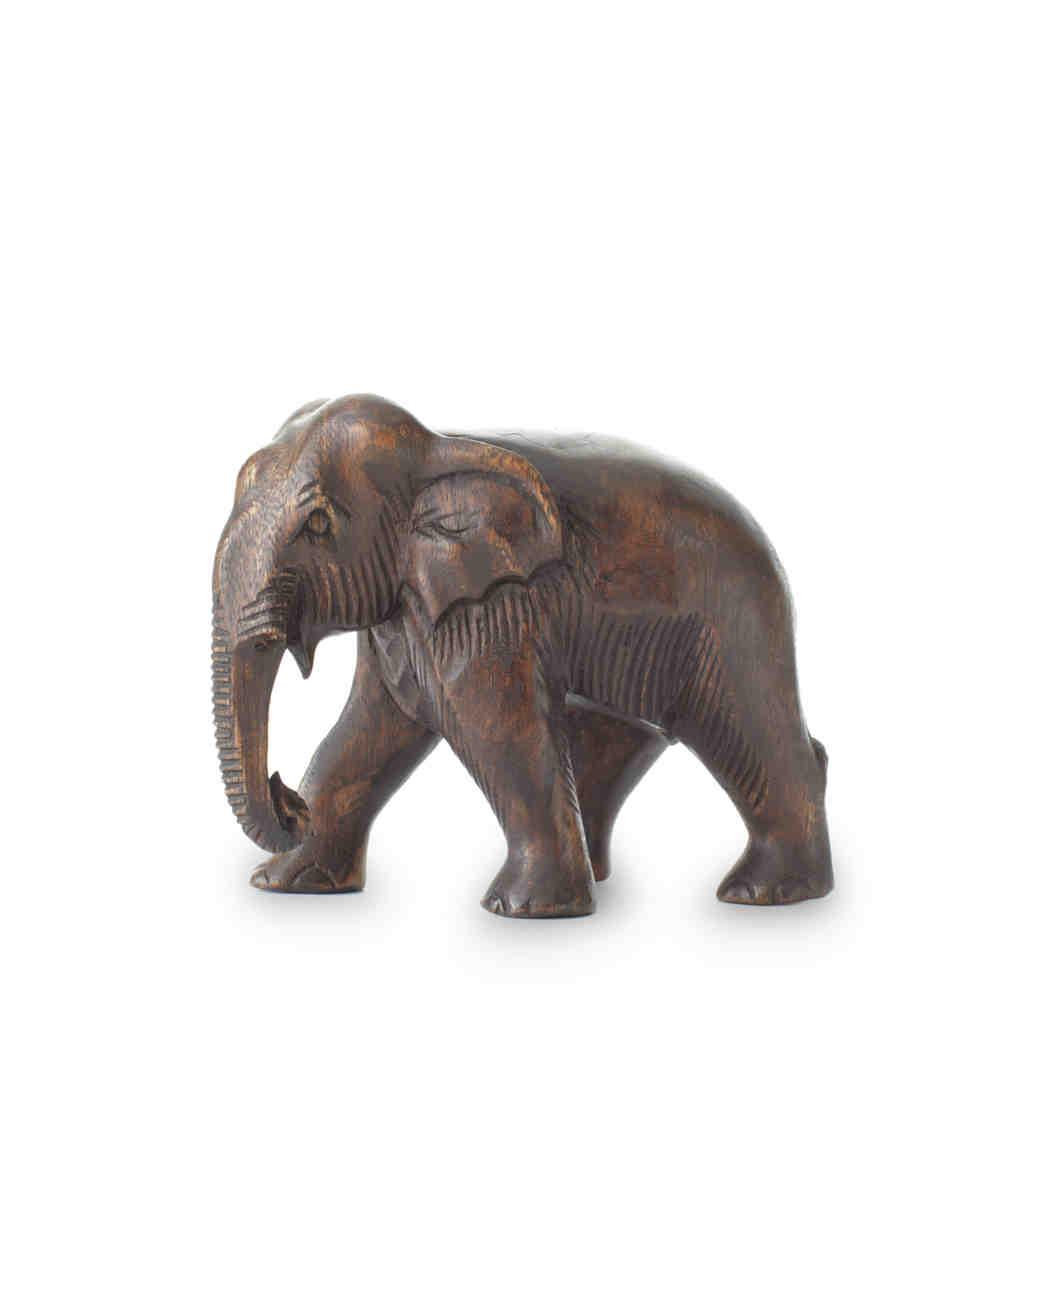 ryan-mika-honeymoon-elephant-mwds109105.jpg